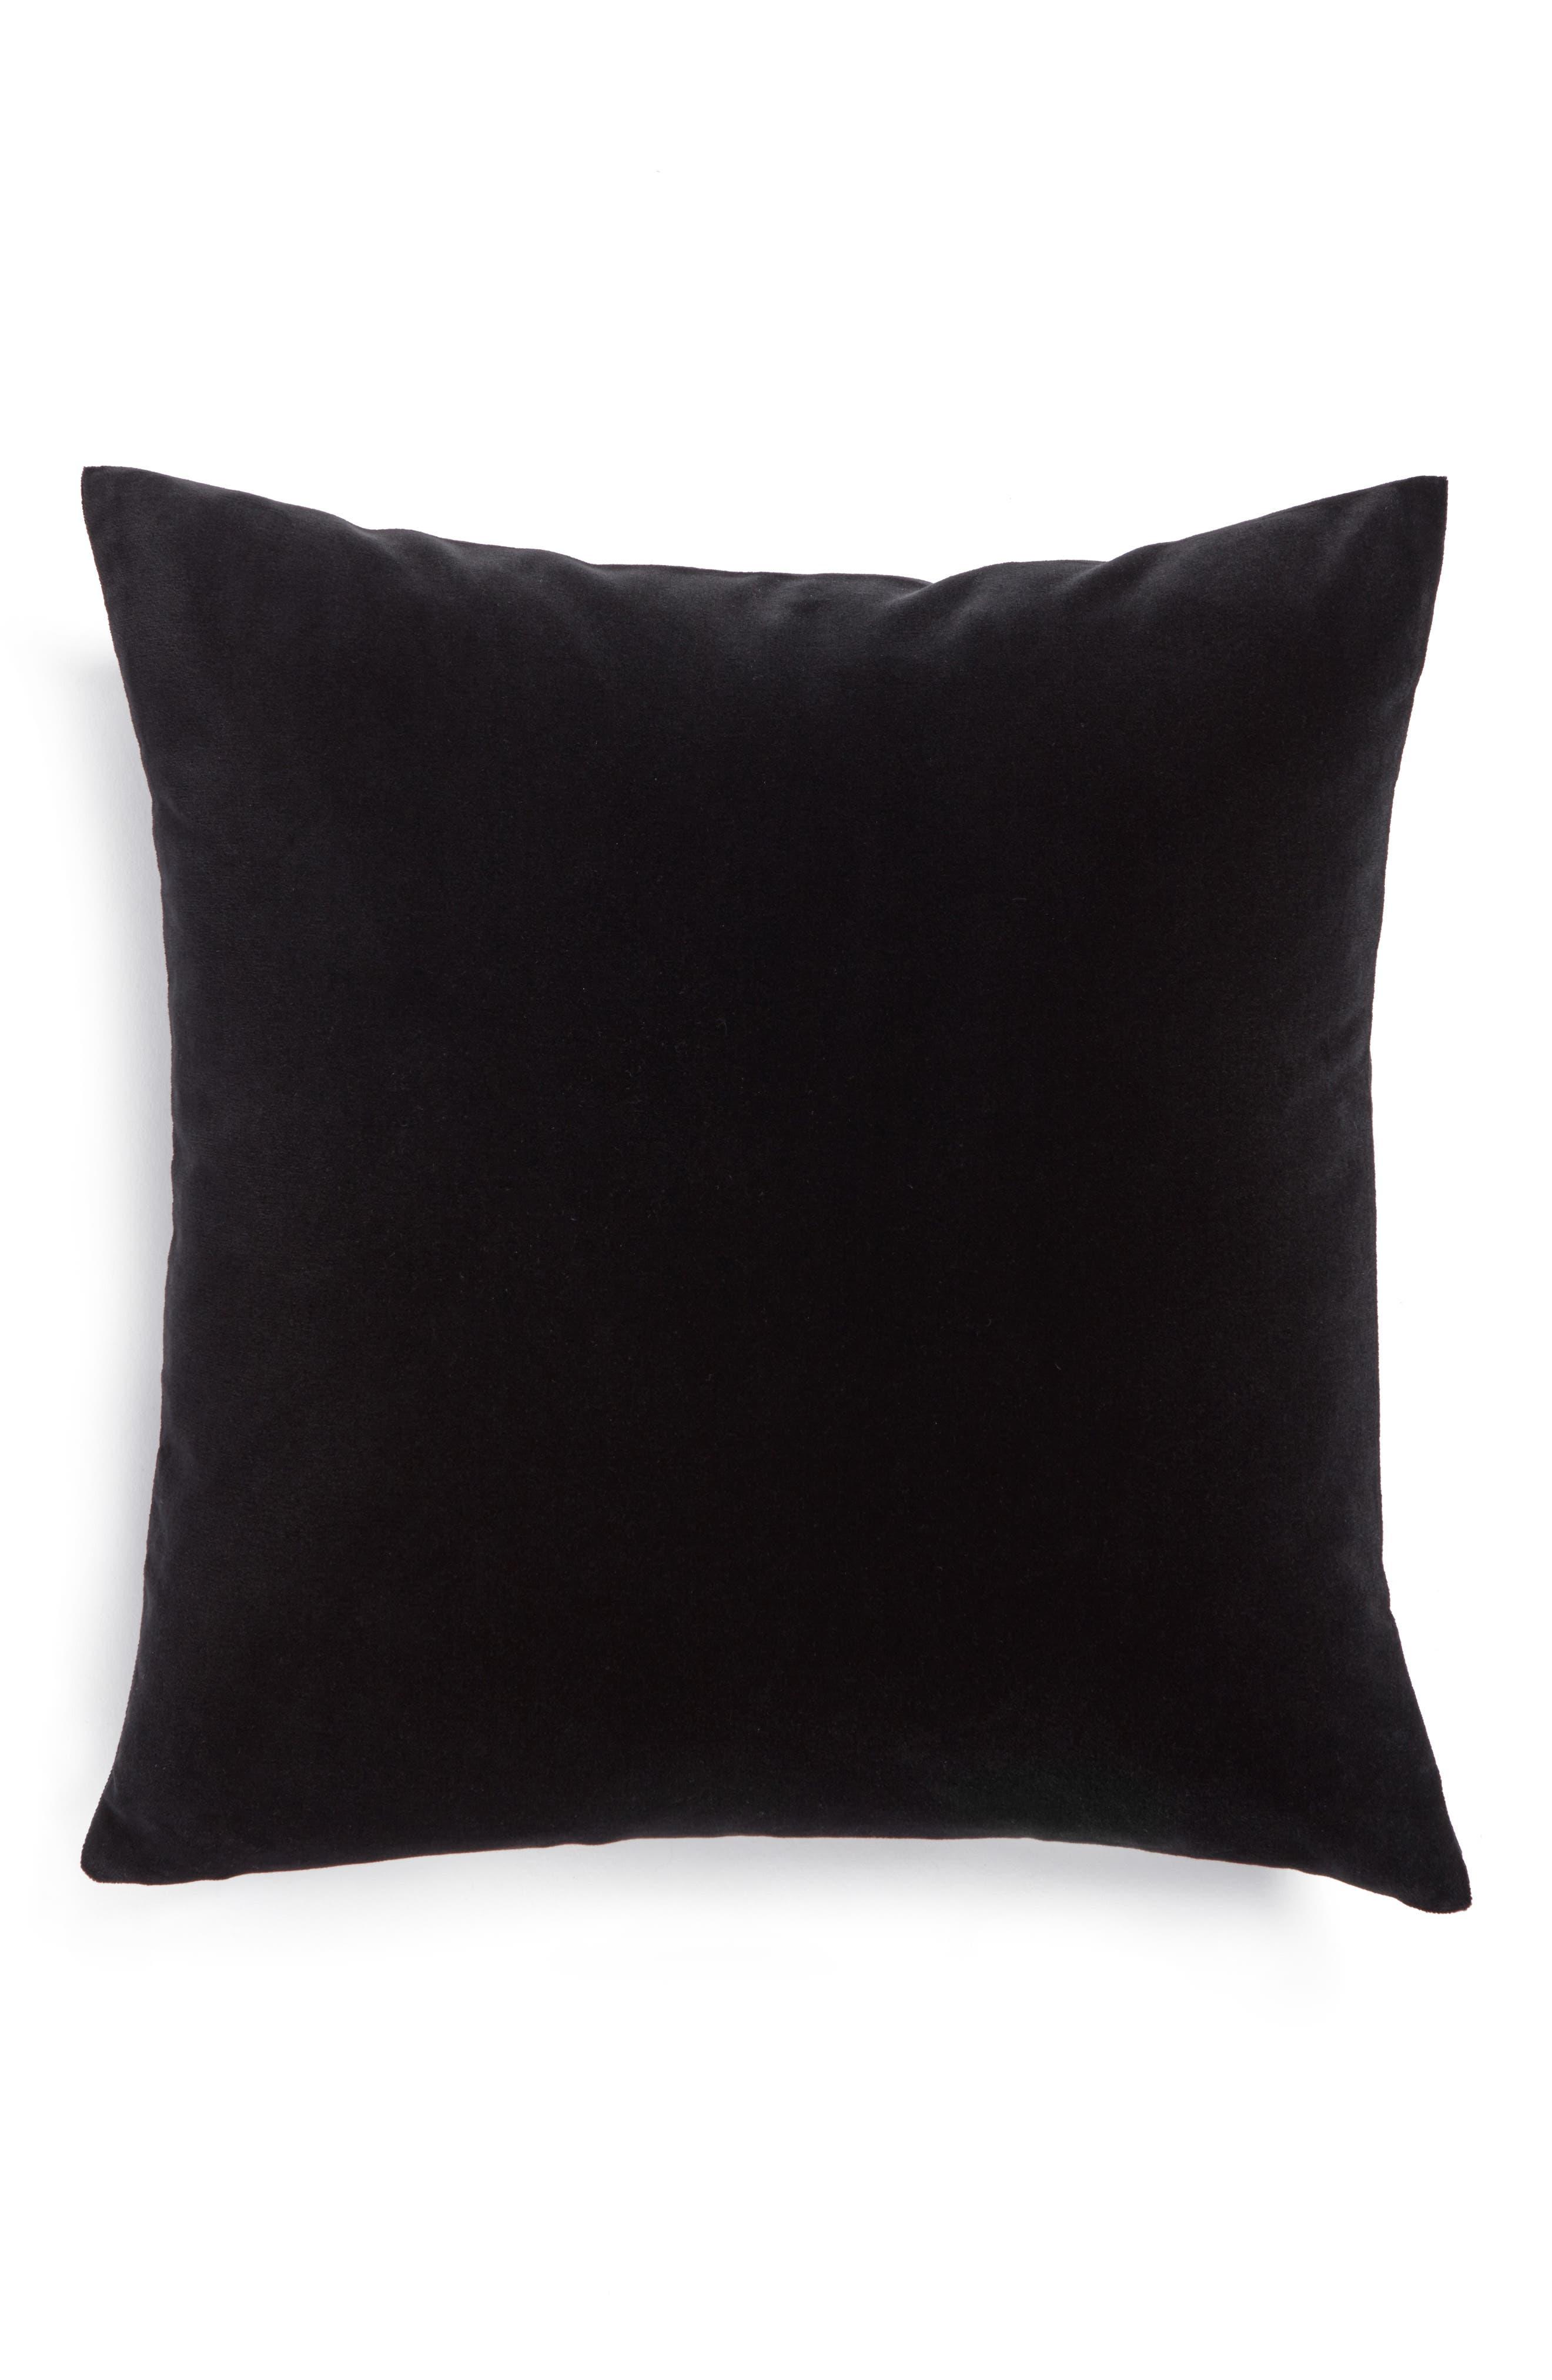 Lucerne Velvet Pillow,                         Main,                         color, 001